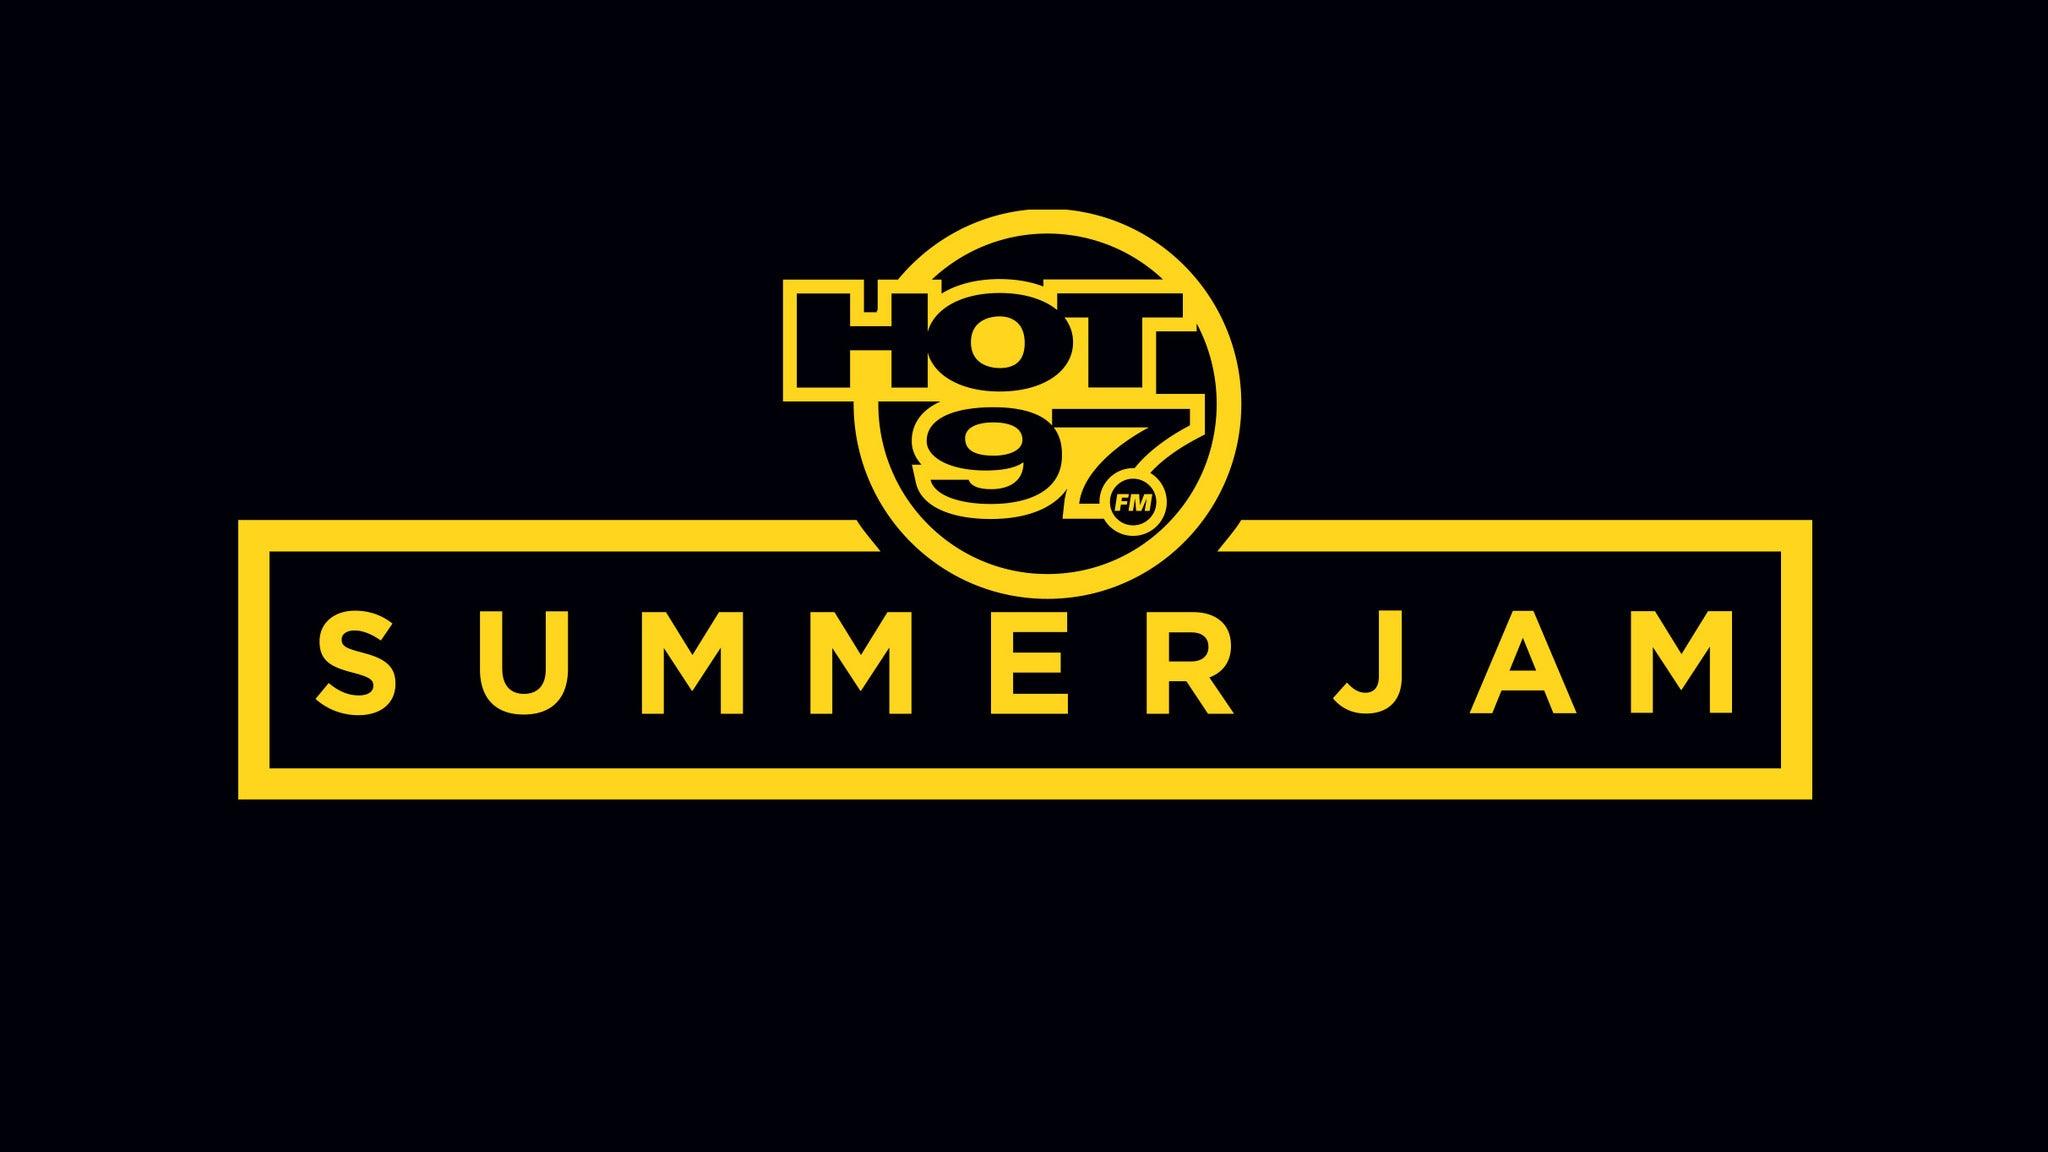 Hot 97 Announces The Return of Summer Jam Concert in August